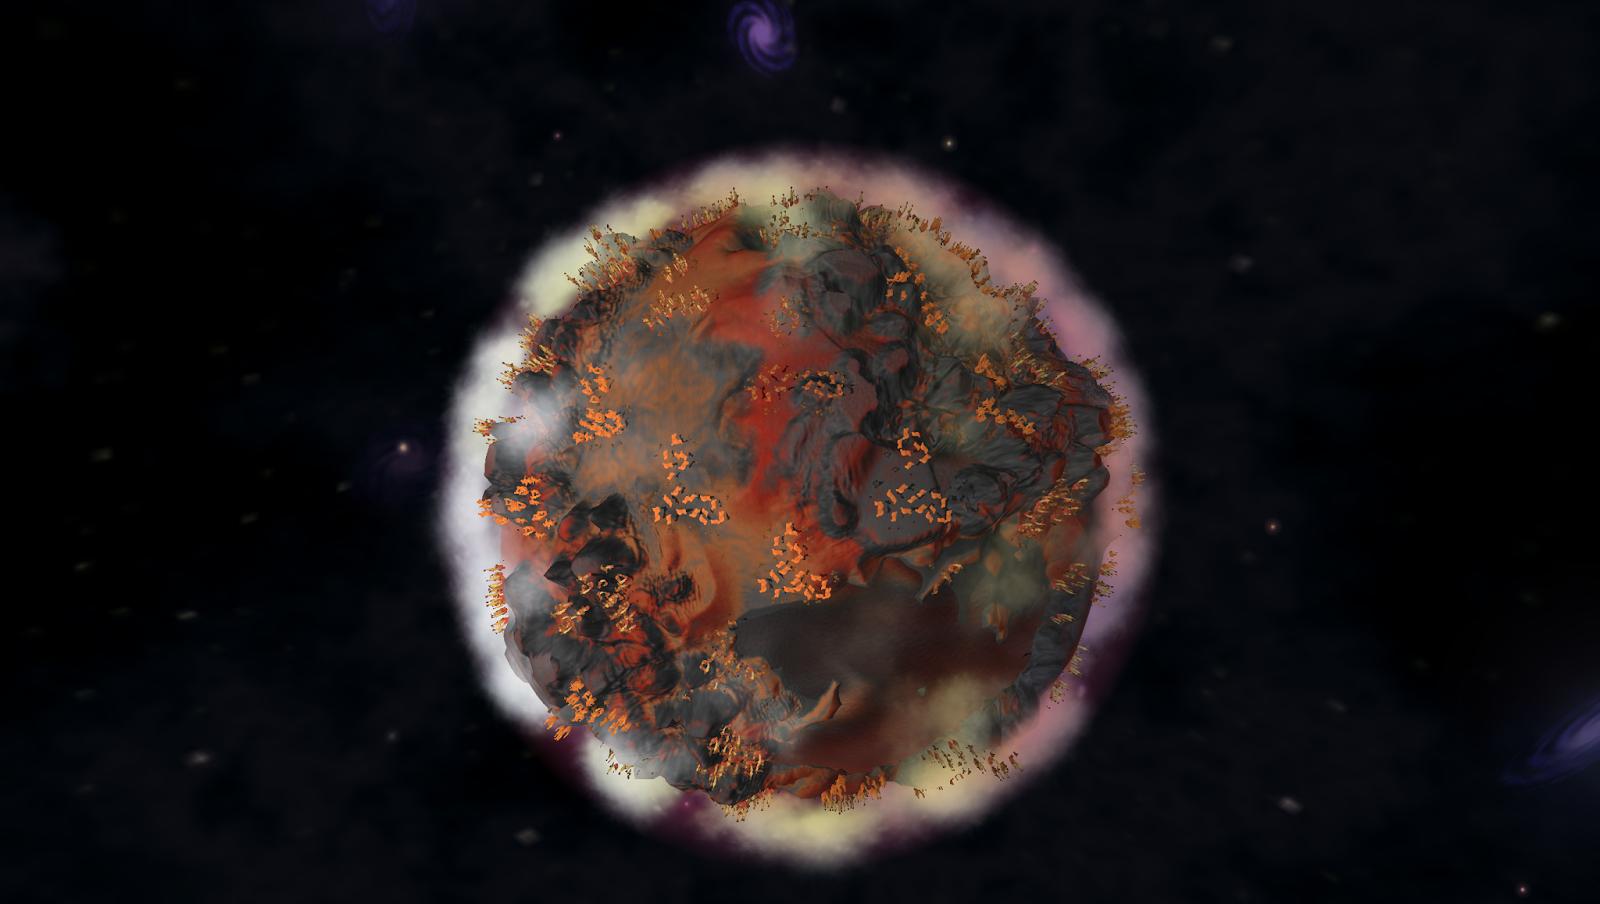 Roodonitas ~ Spore Galaxies: The Fallen Spore_13-02-2018_22-37-15